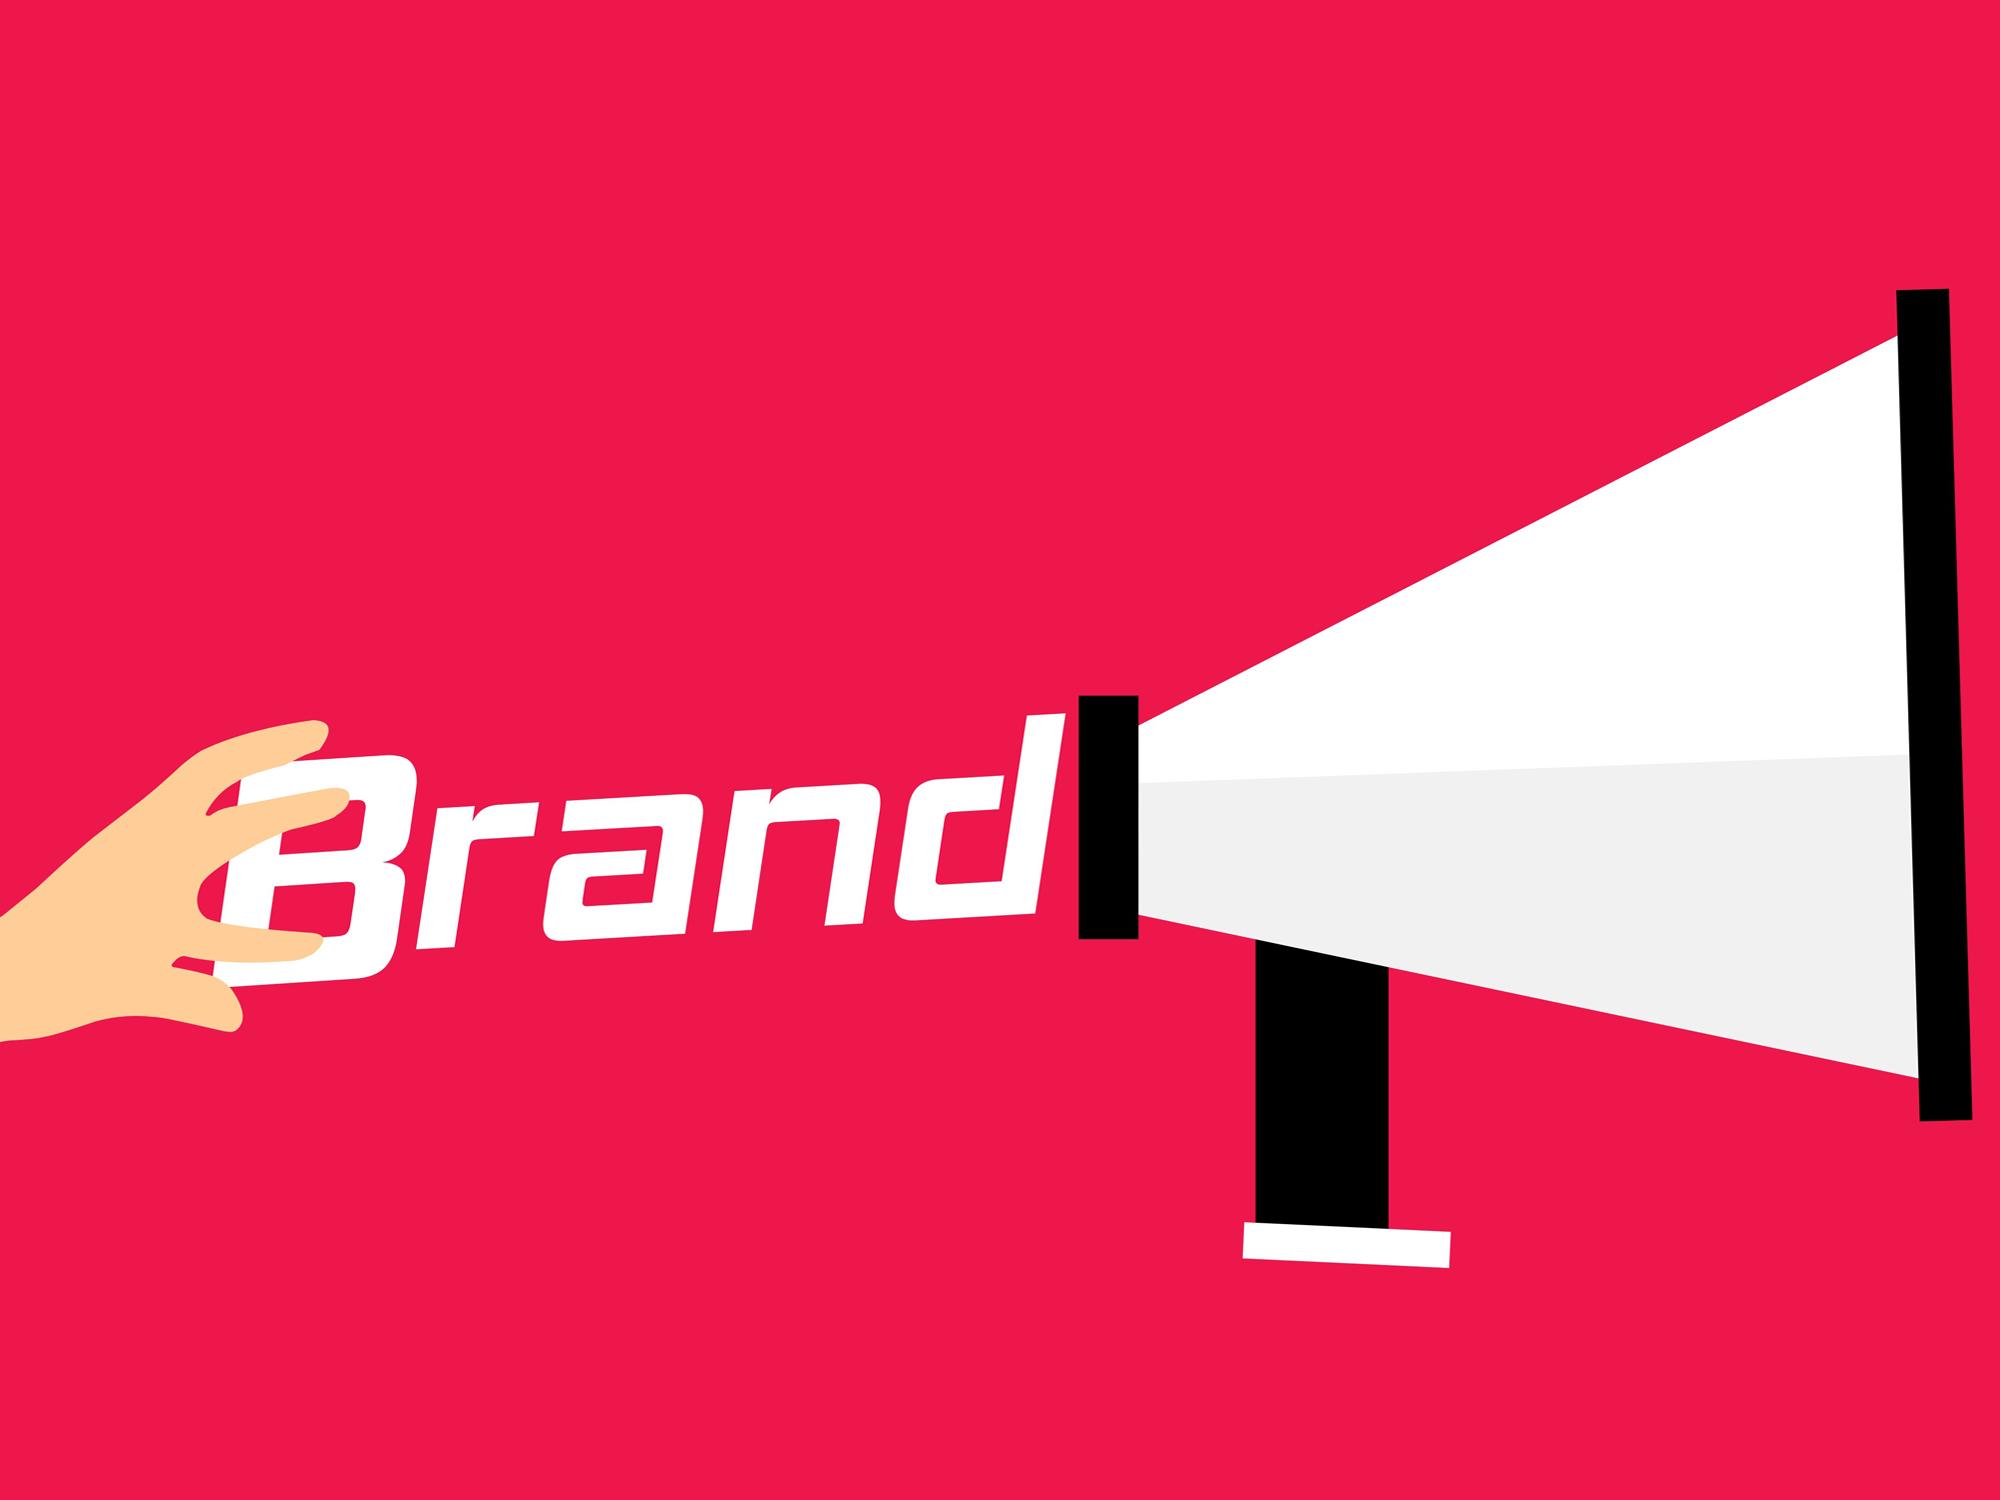 Proposition de valeur de marque - Agence Sharing